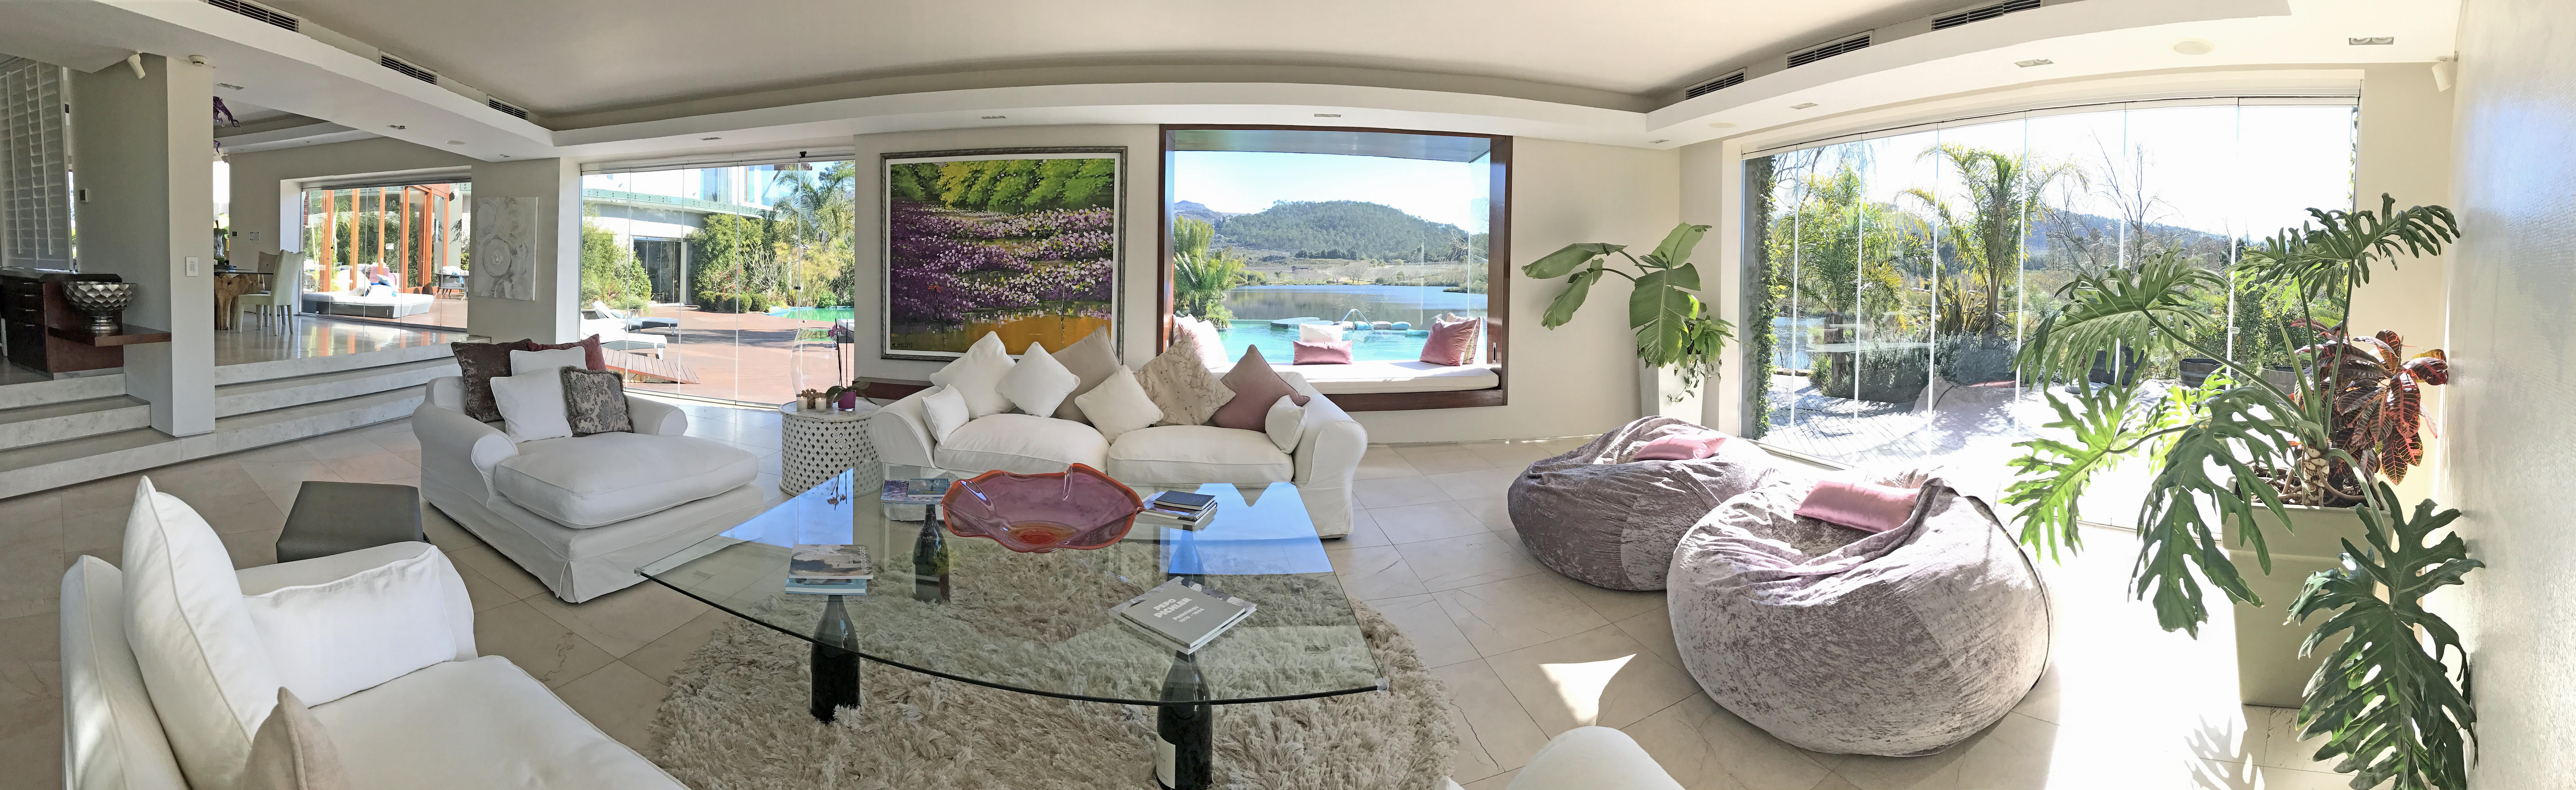 Groovy True Luxury Villas And Properties In Elgin To Rent Machost Co Dining Chair Design Ideas Machostcouk